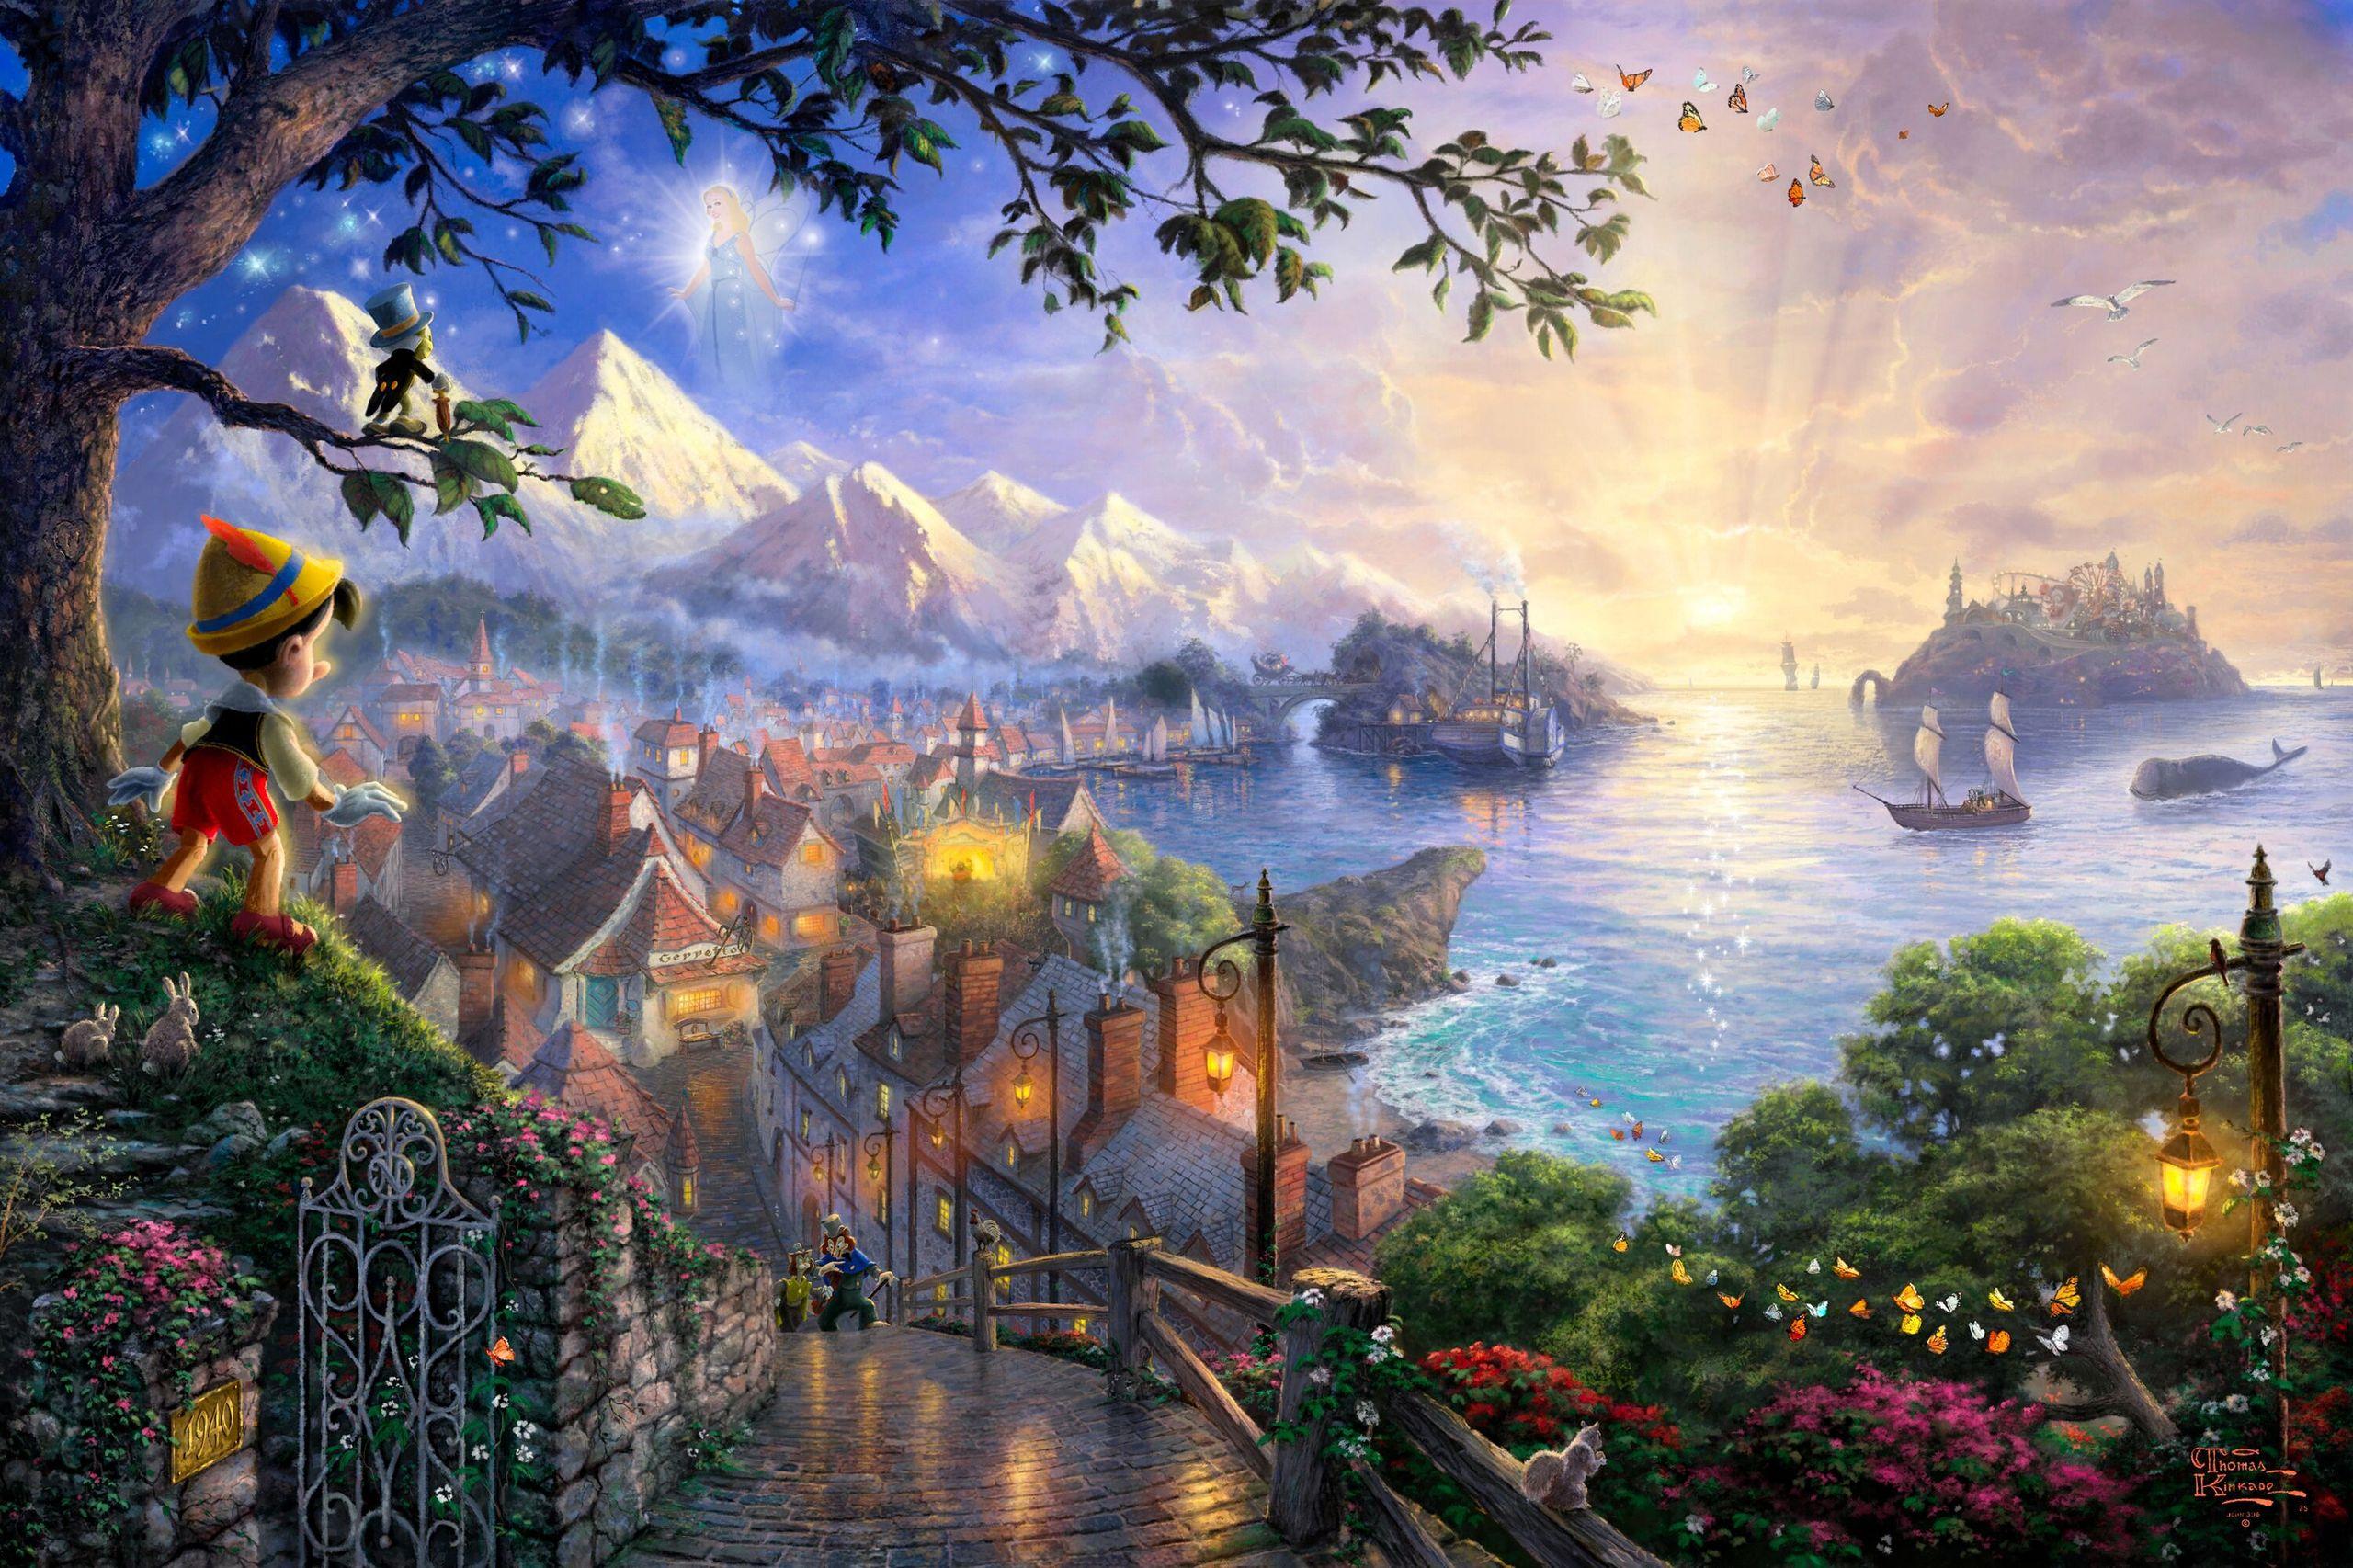 Walt Disney Wallpapers Pinocchio walt disney characters 28821831 2560 2560x1706